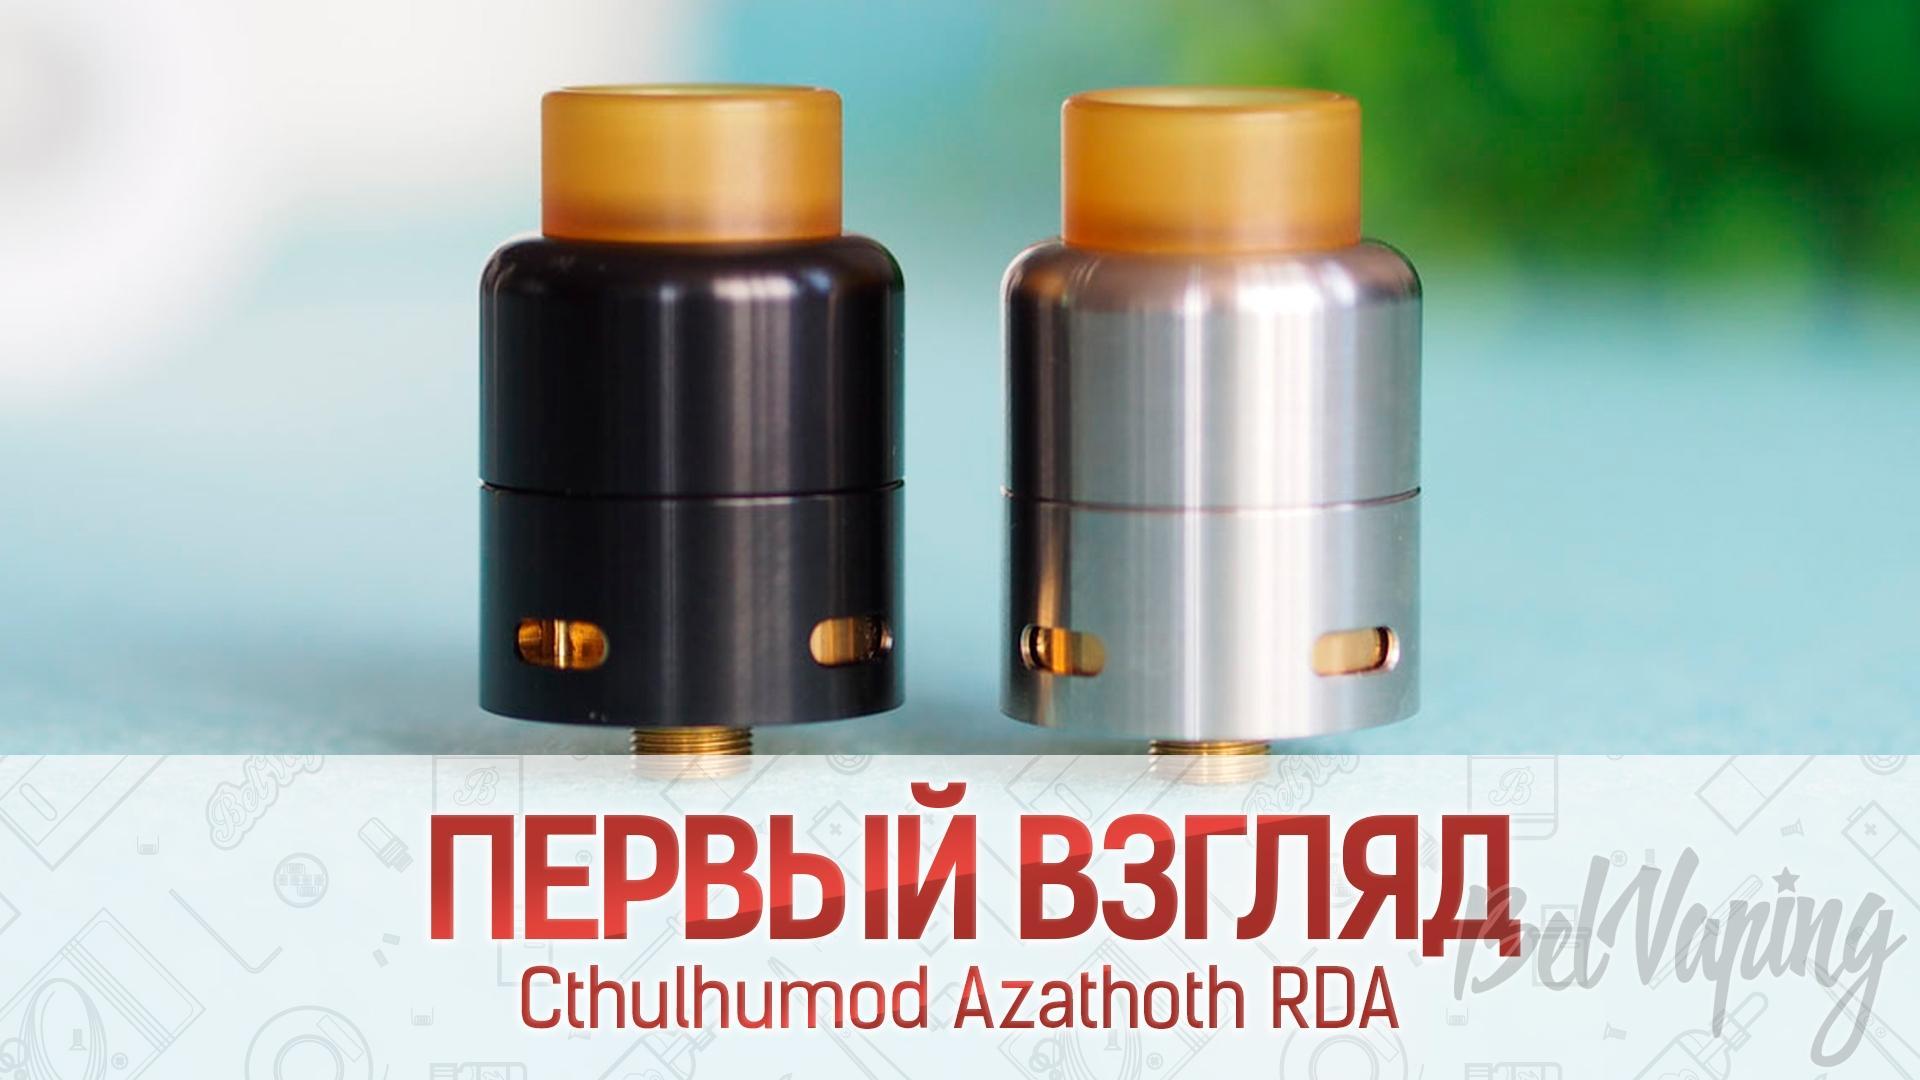 Cthulhumod Azathoth RDA. Первый взгляд